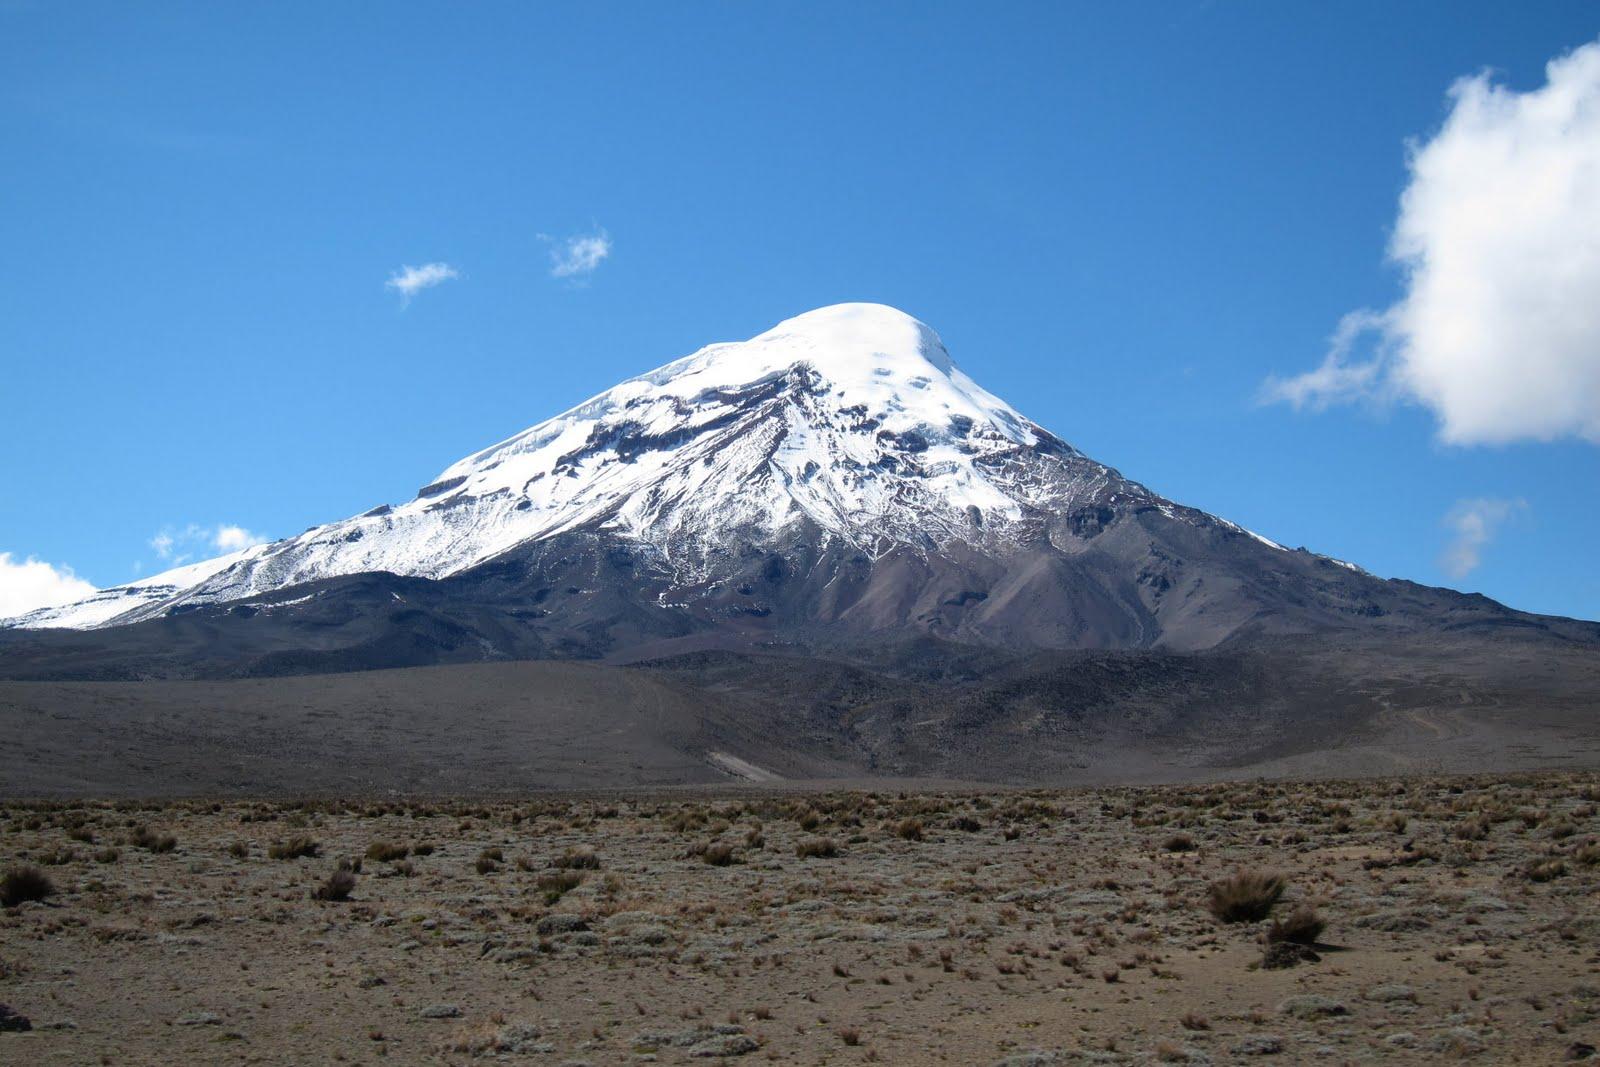 Chimborazo (foto da internet)